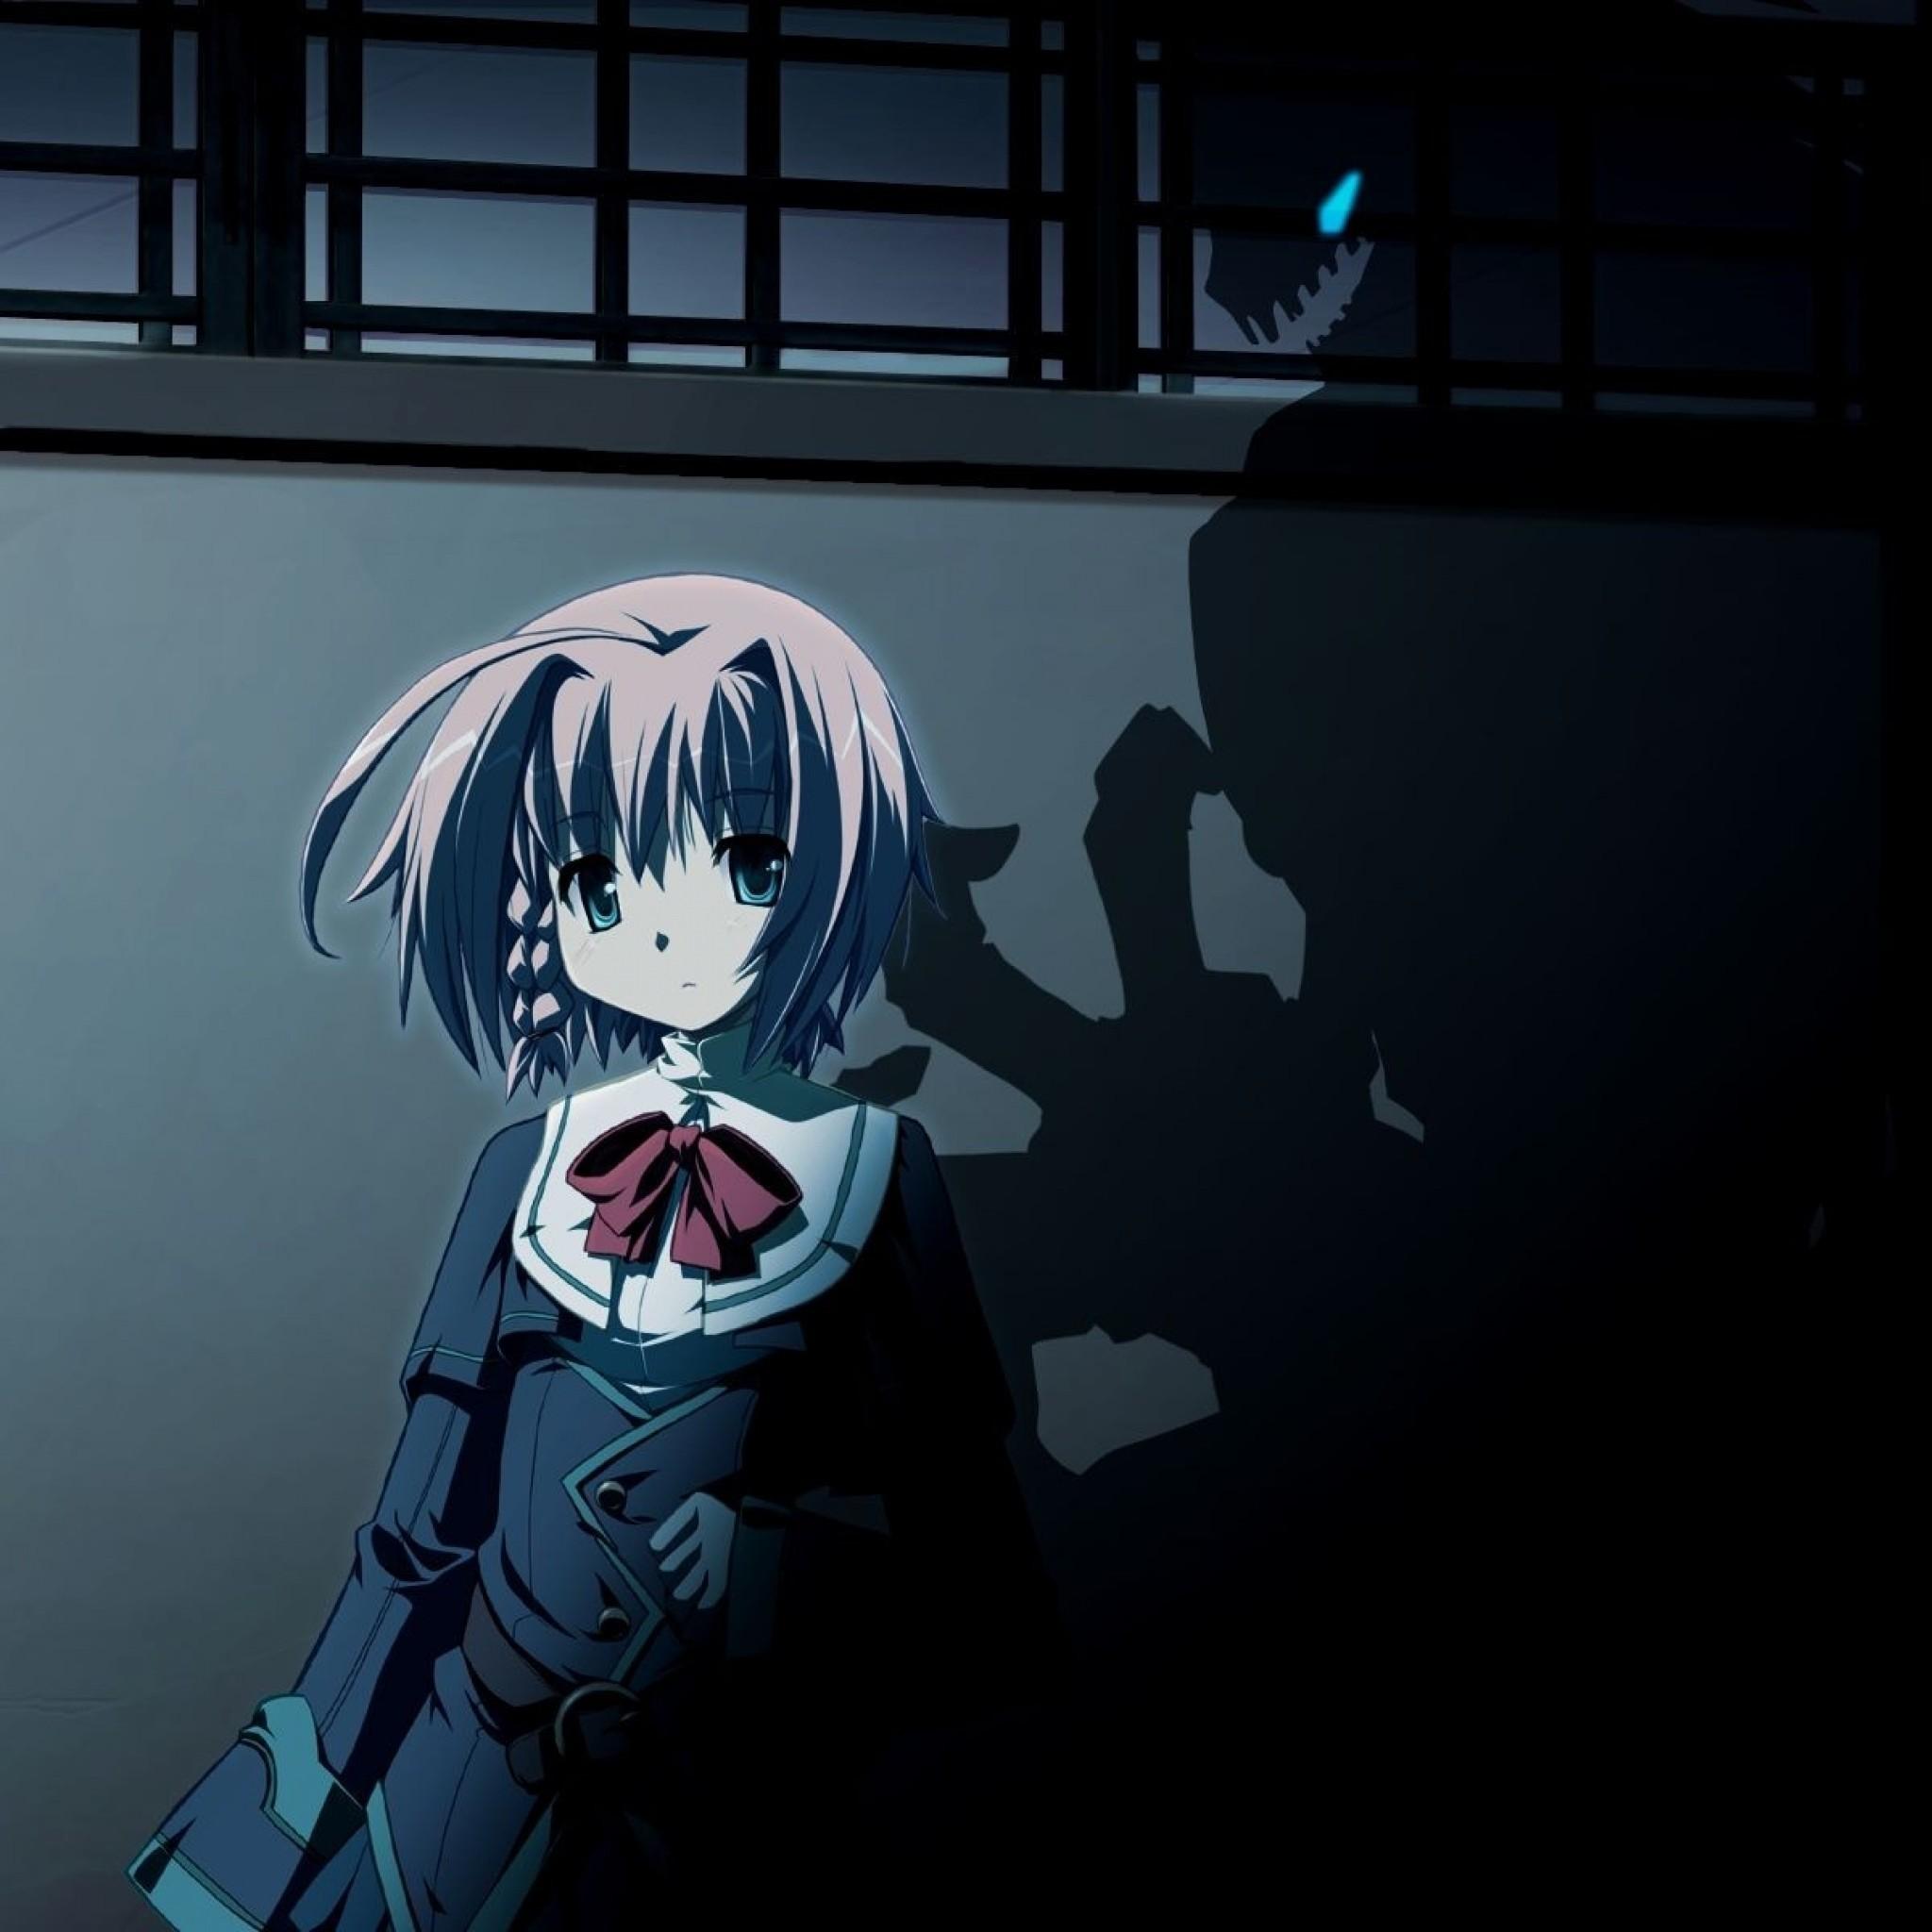 Wallpaper anime, girl, young, dark, shadow